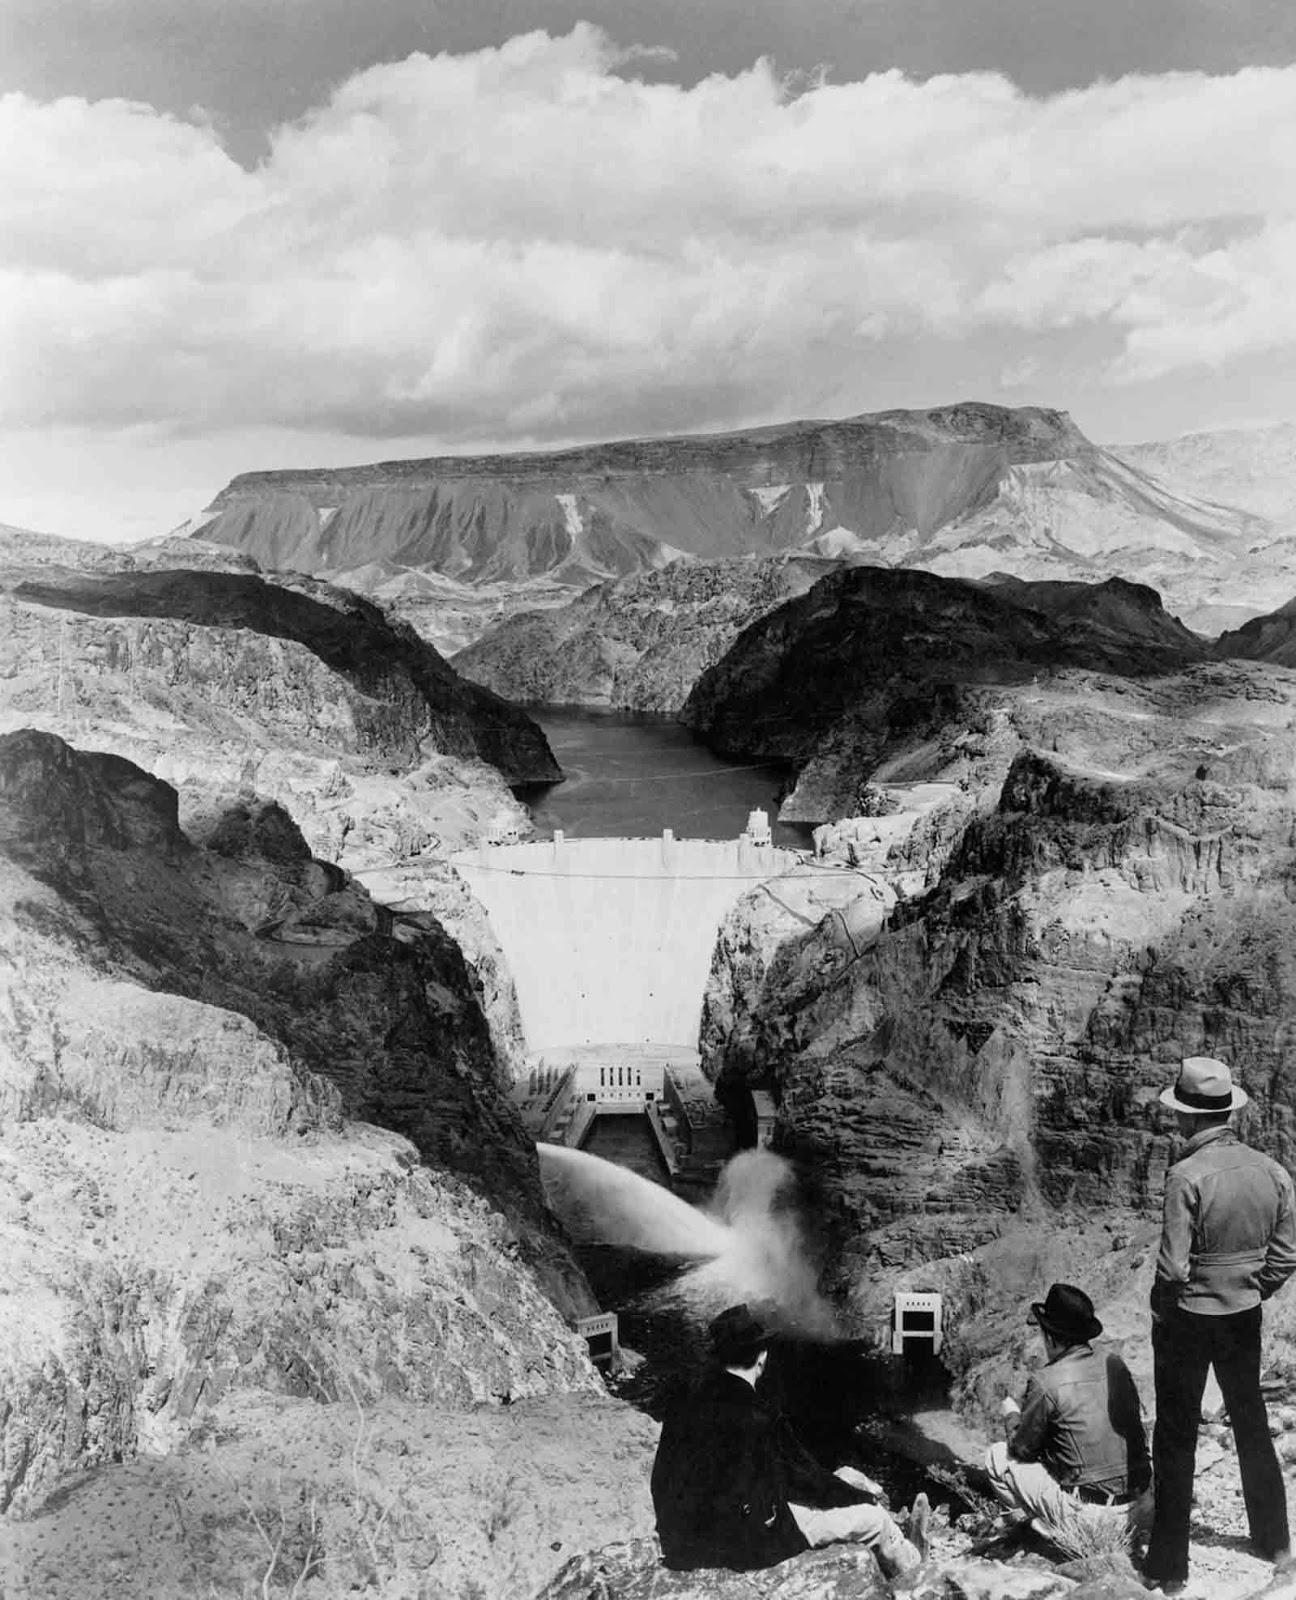 Hoover Dam in 1940.